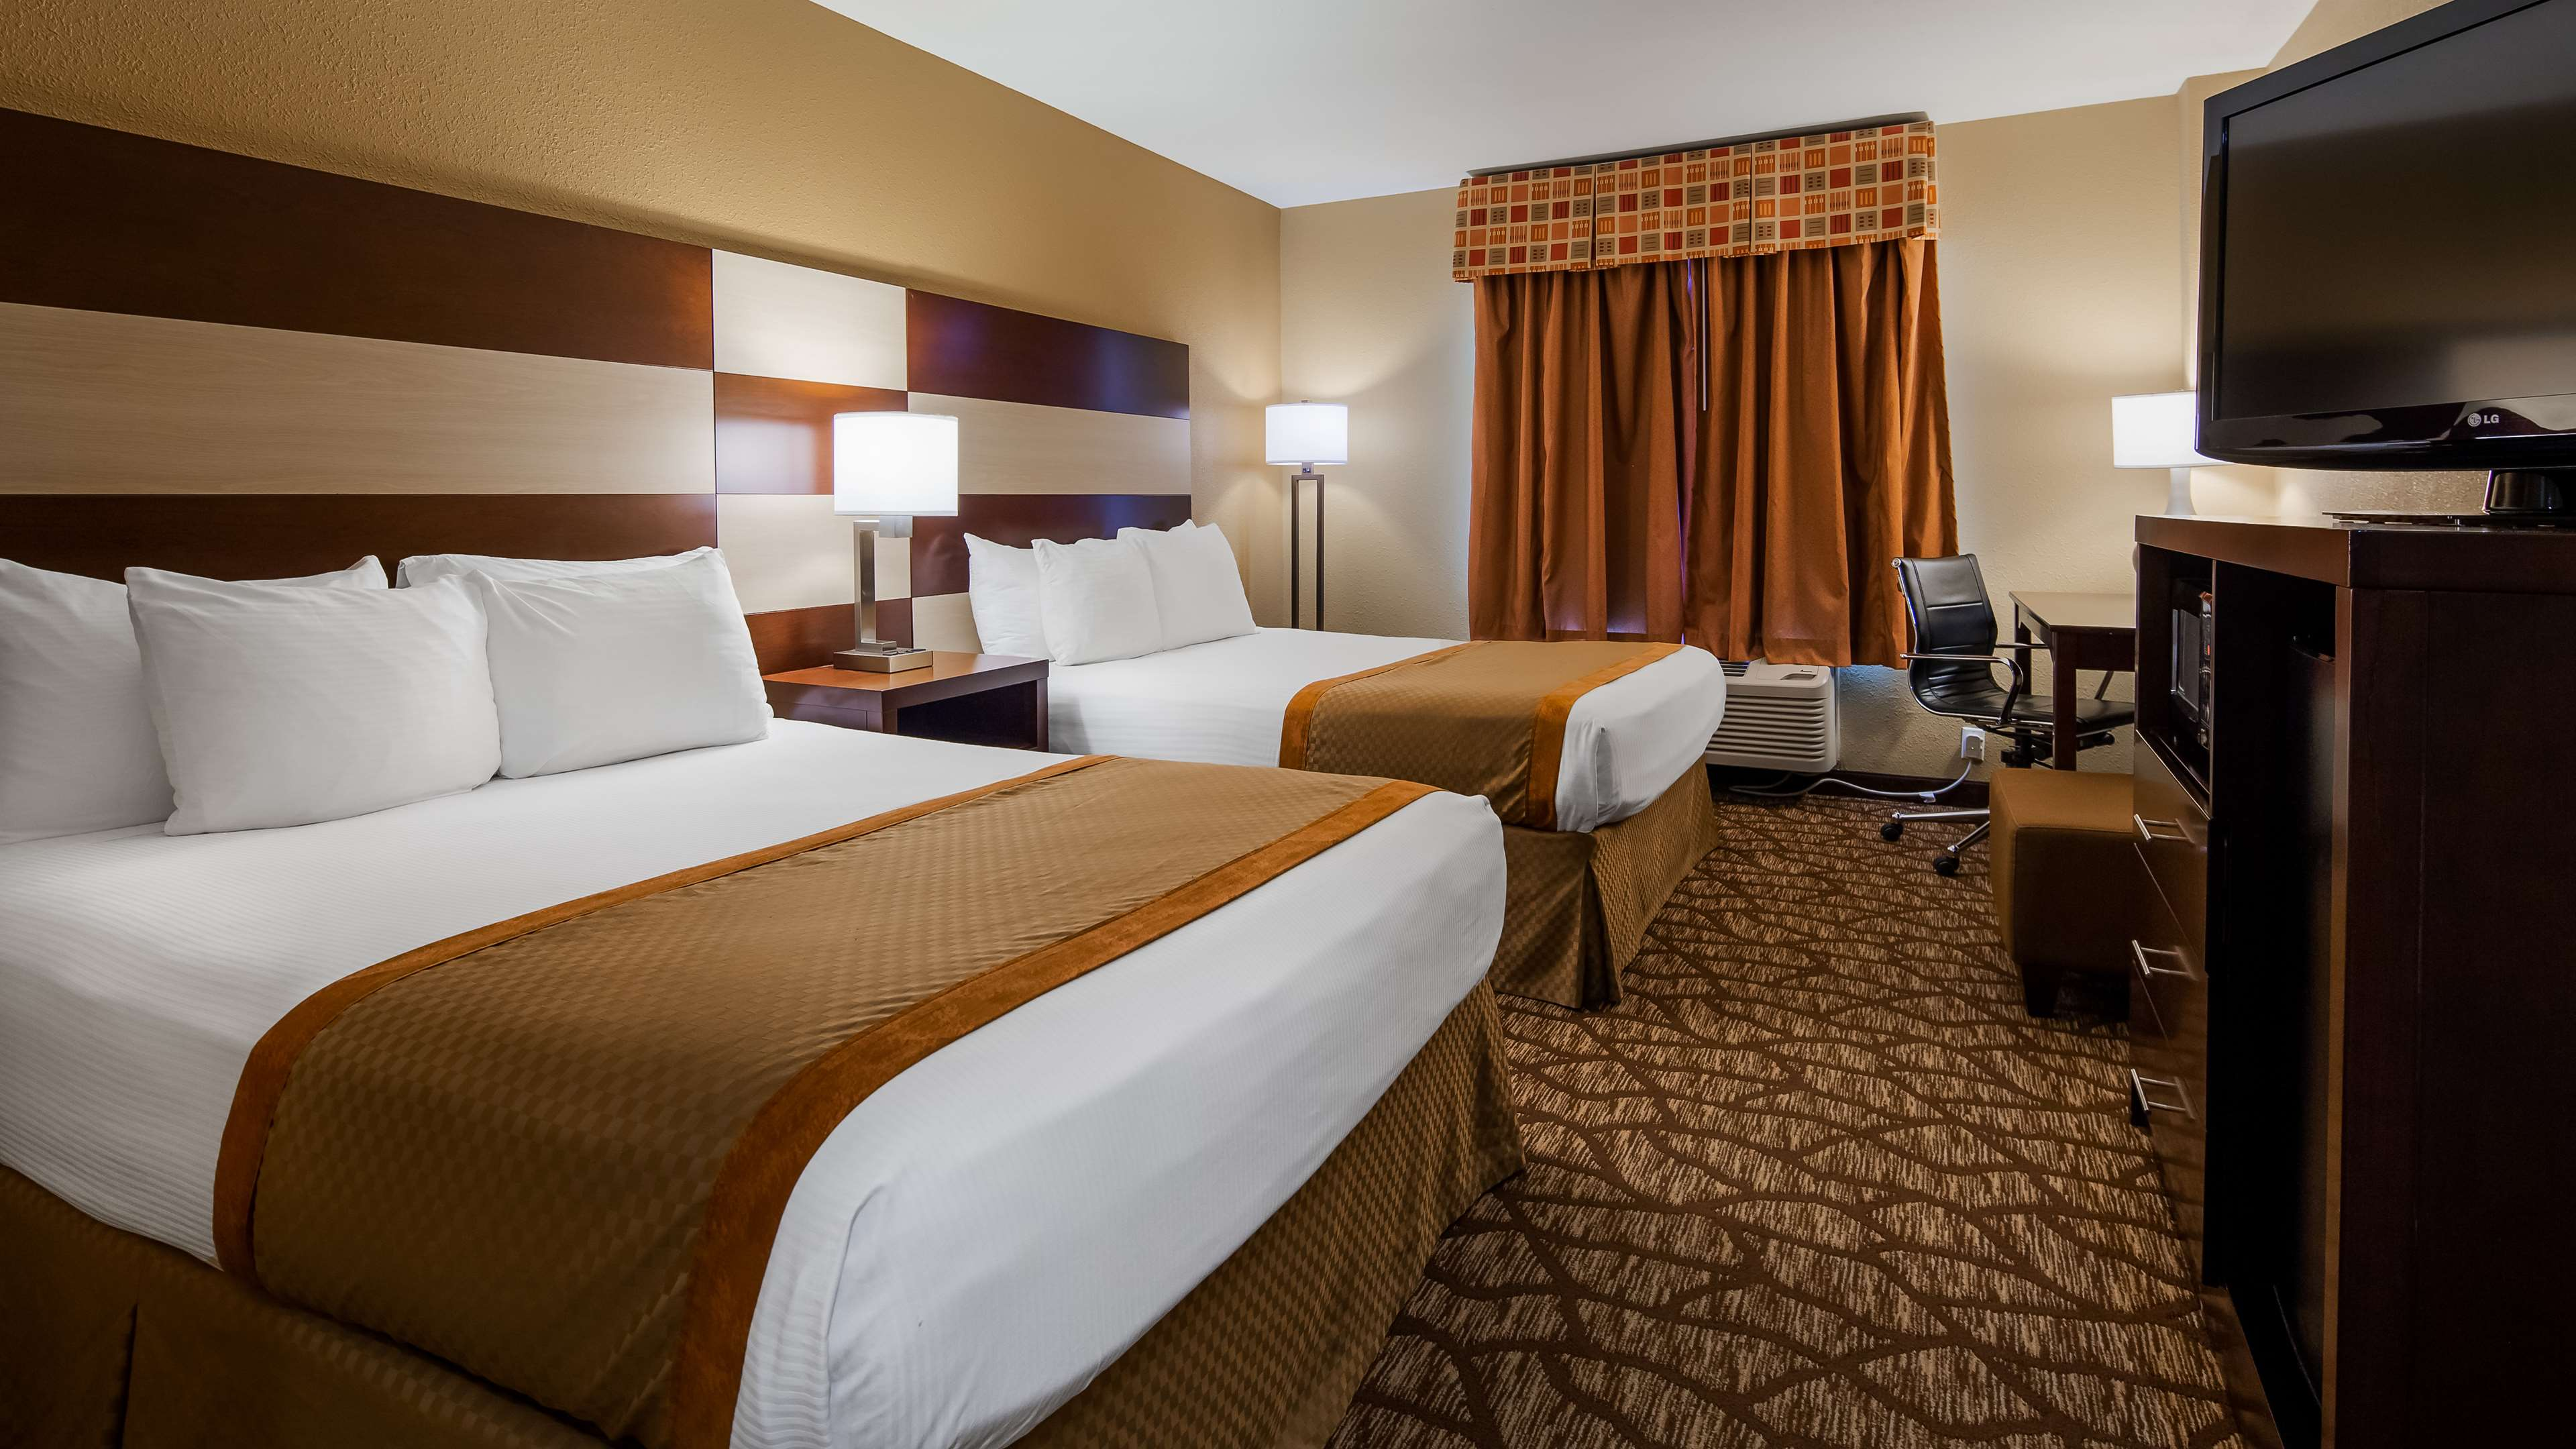 Best Western Joliet Inn & Suites image 9